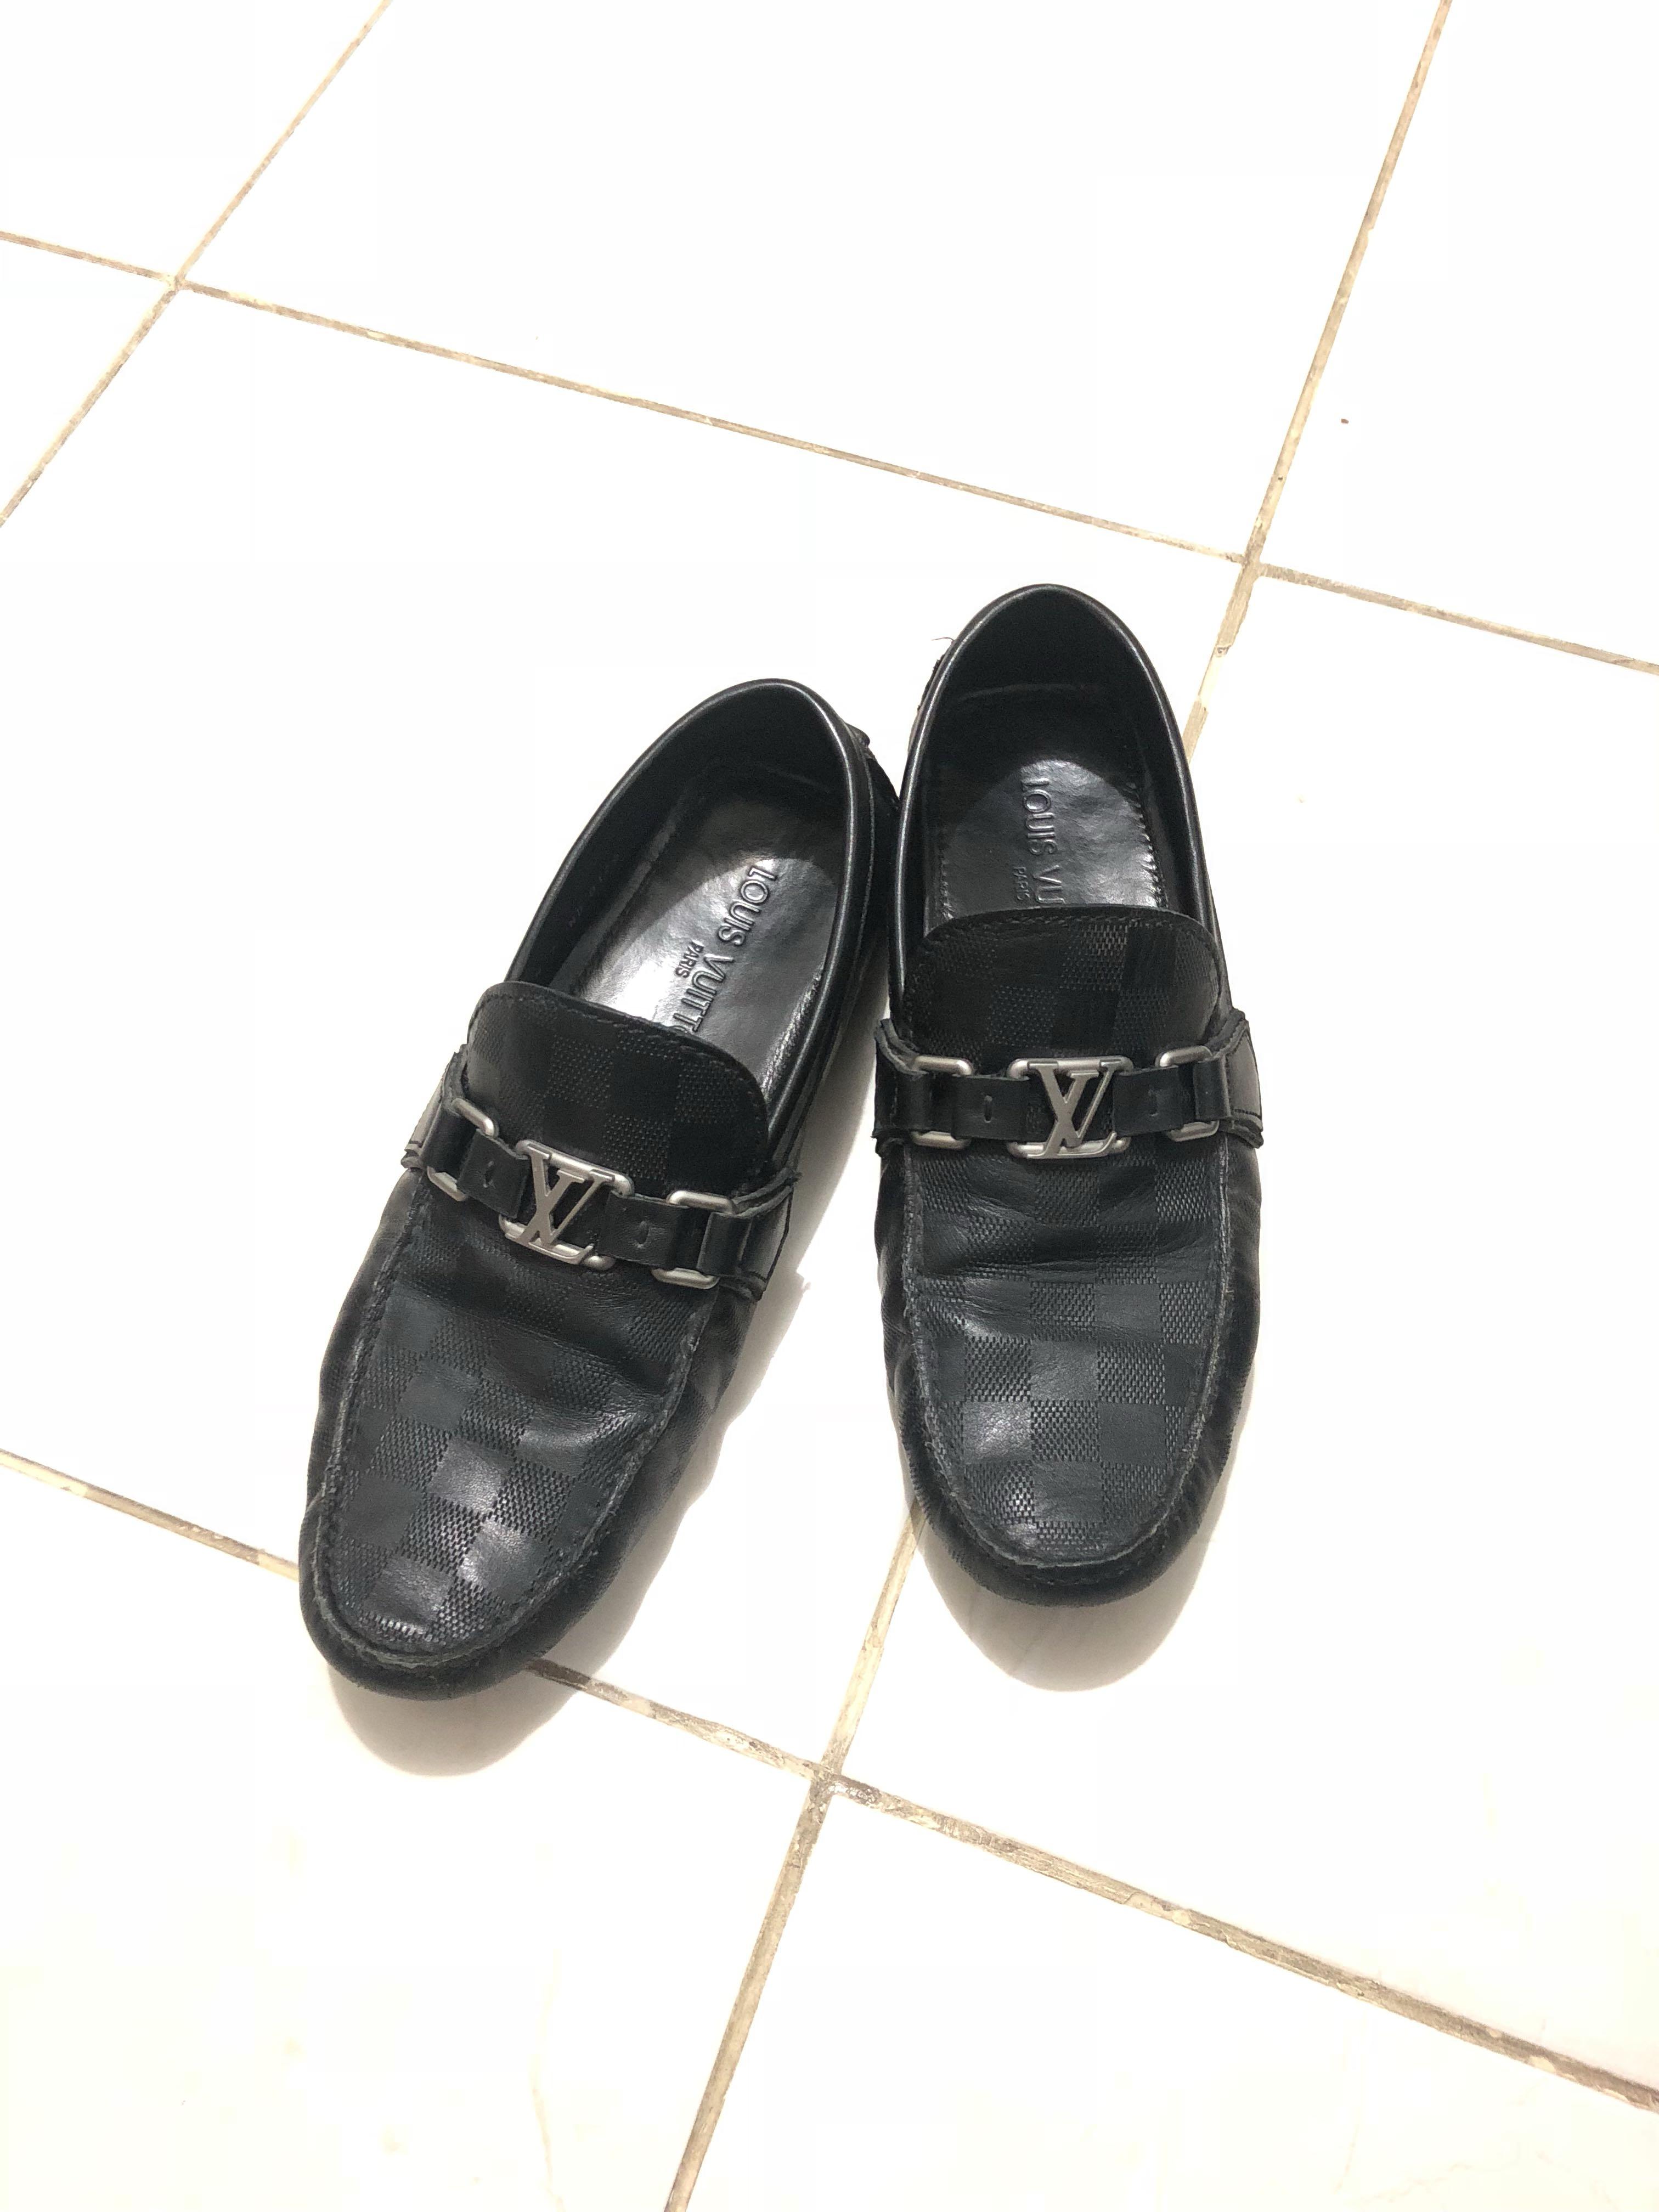 Louis Vuitton LV Black Damier Shoes Super Mirror Quality 1 1 ... 9ca27b33b1